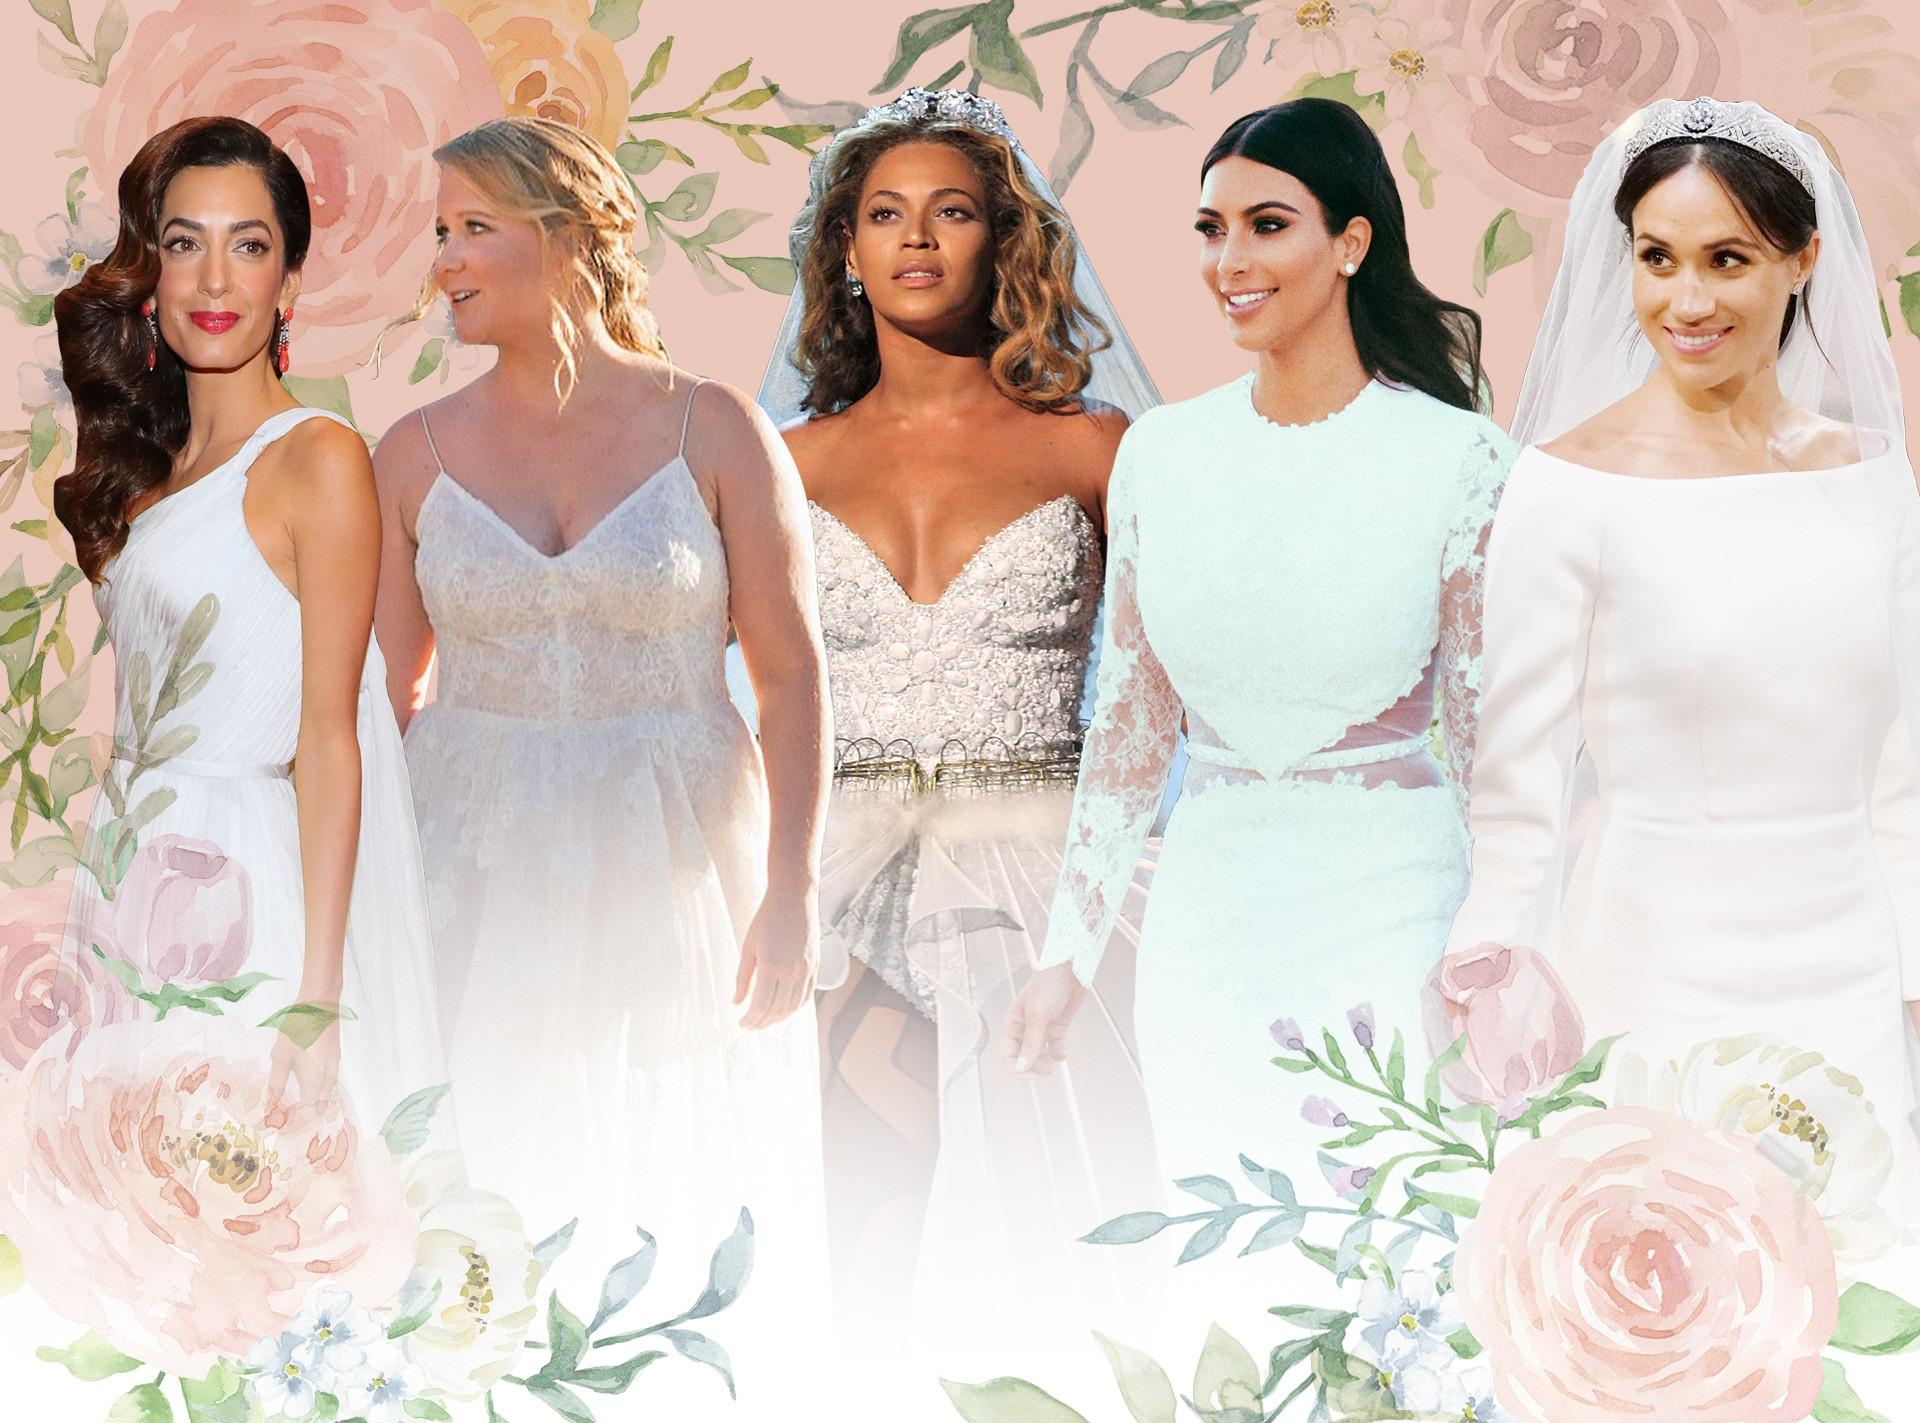 Bridal Quiz, Amal Clooney, Amy Schumer, Beyonce, Kim Kardashian, Meghan Markle